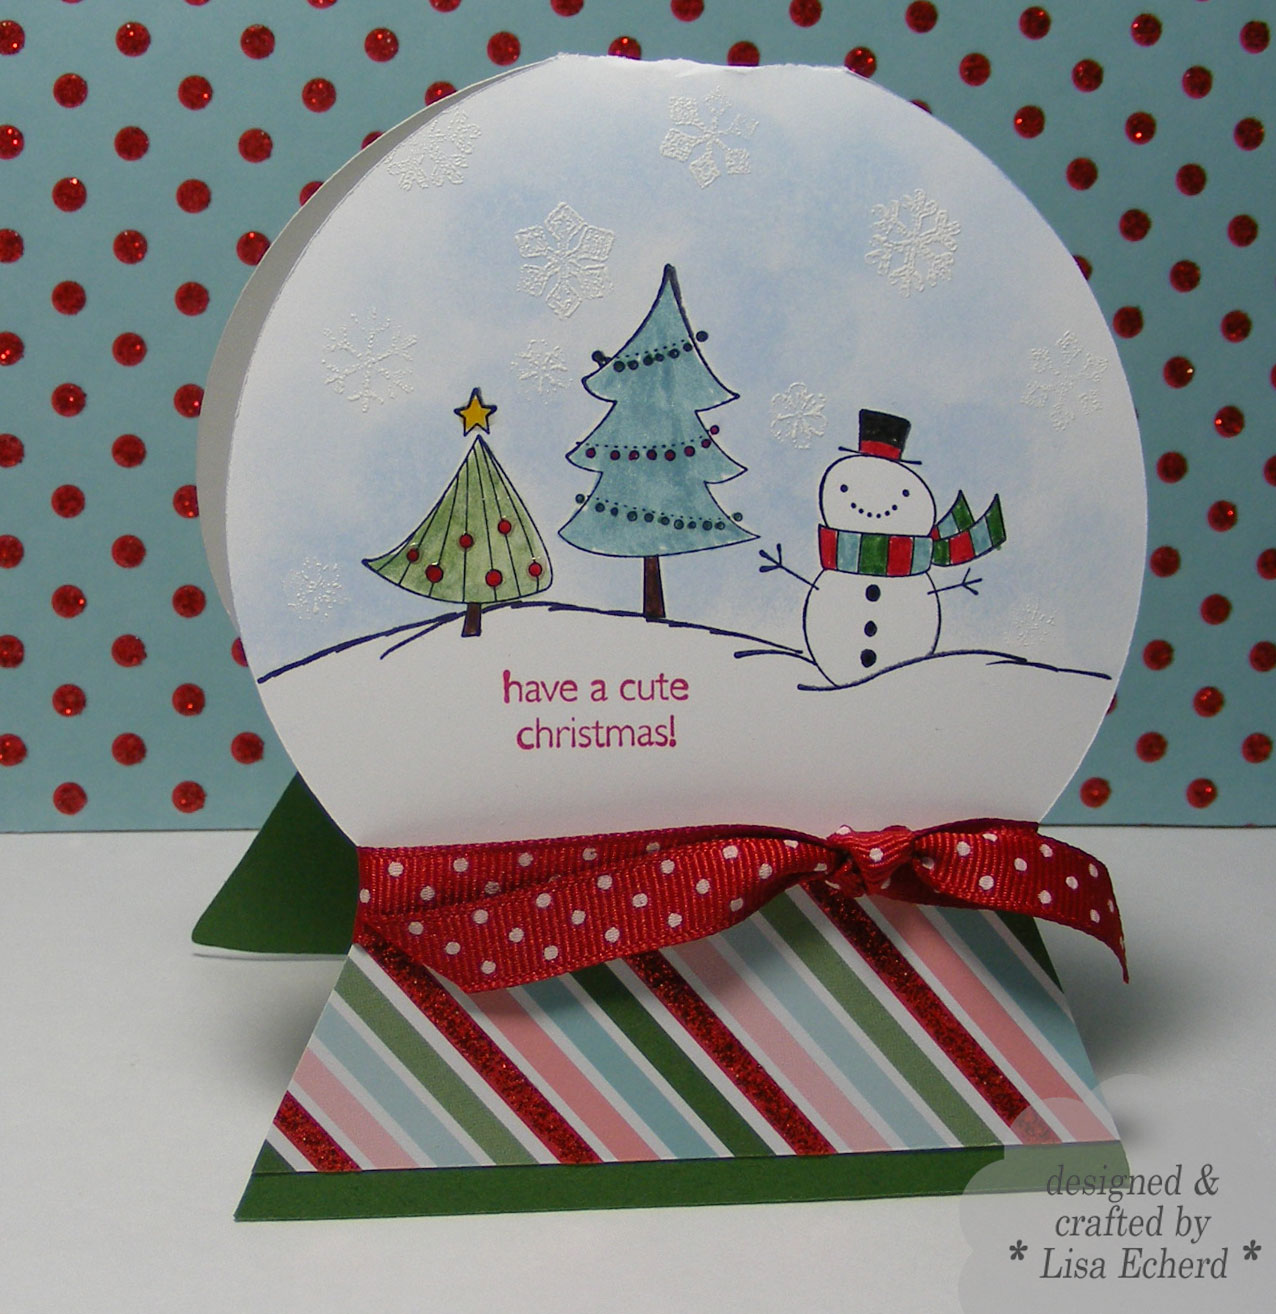 Lisa E Design Blog: Last of the Cute Christmas Cards